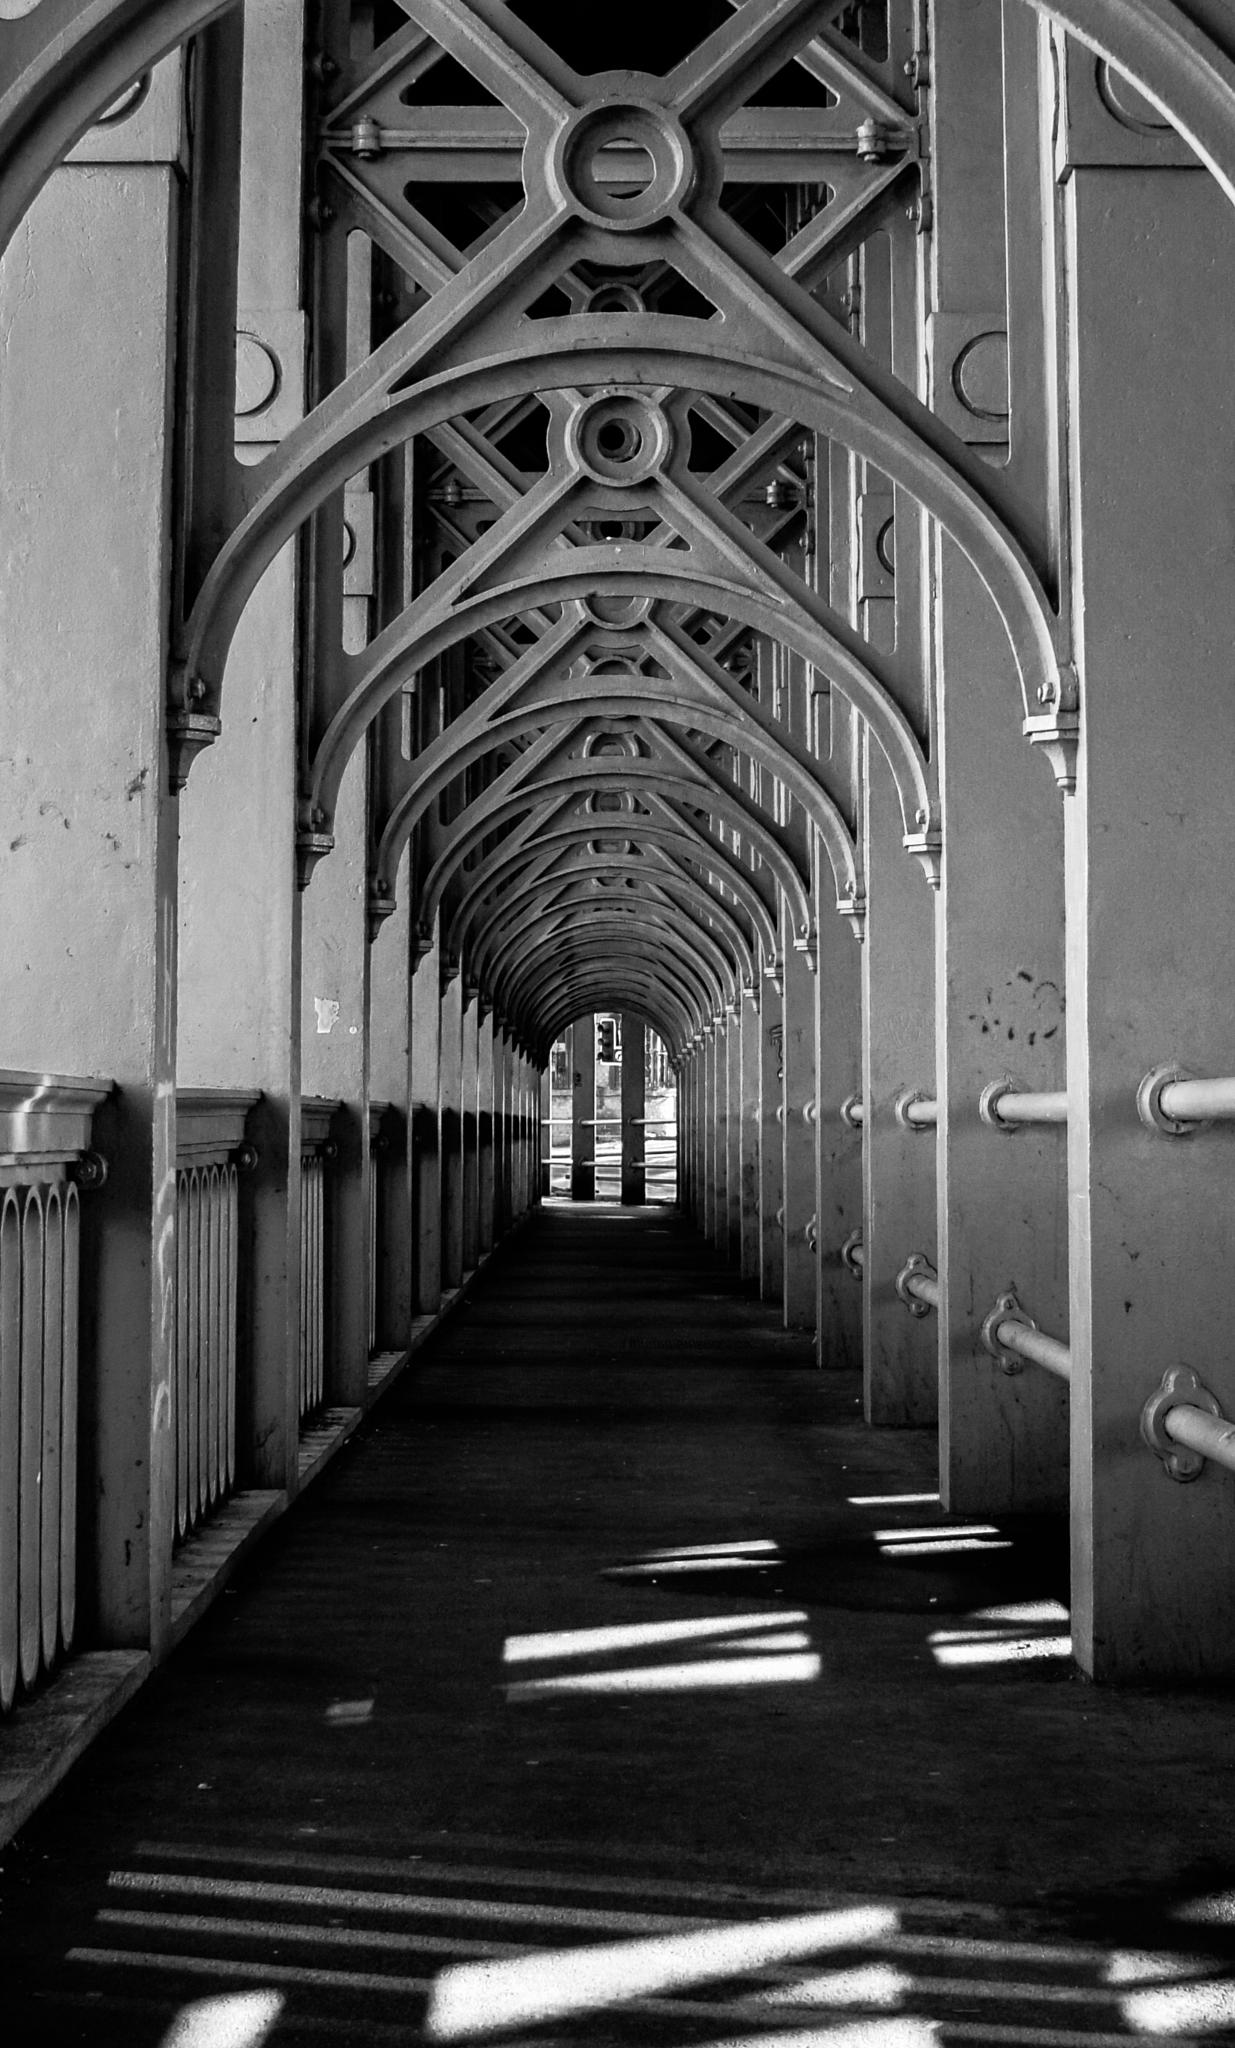 High Level Bridge Newcastle Upon Tyne by JamieMiller